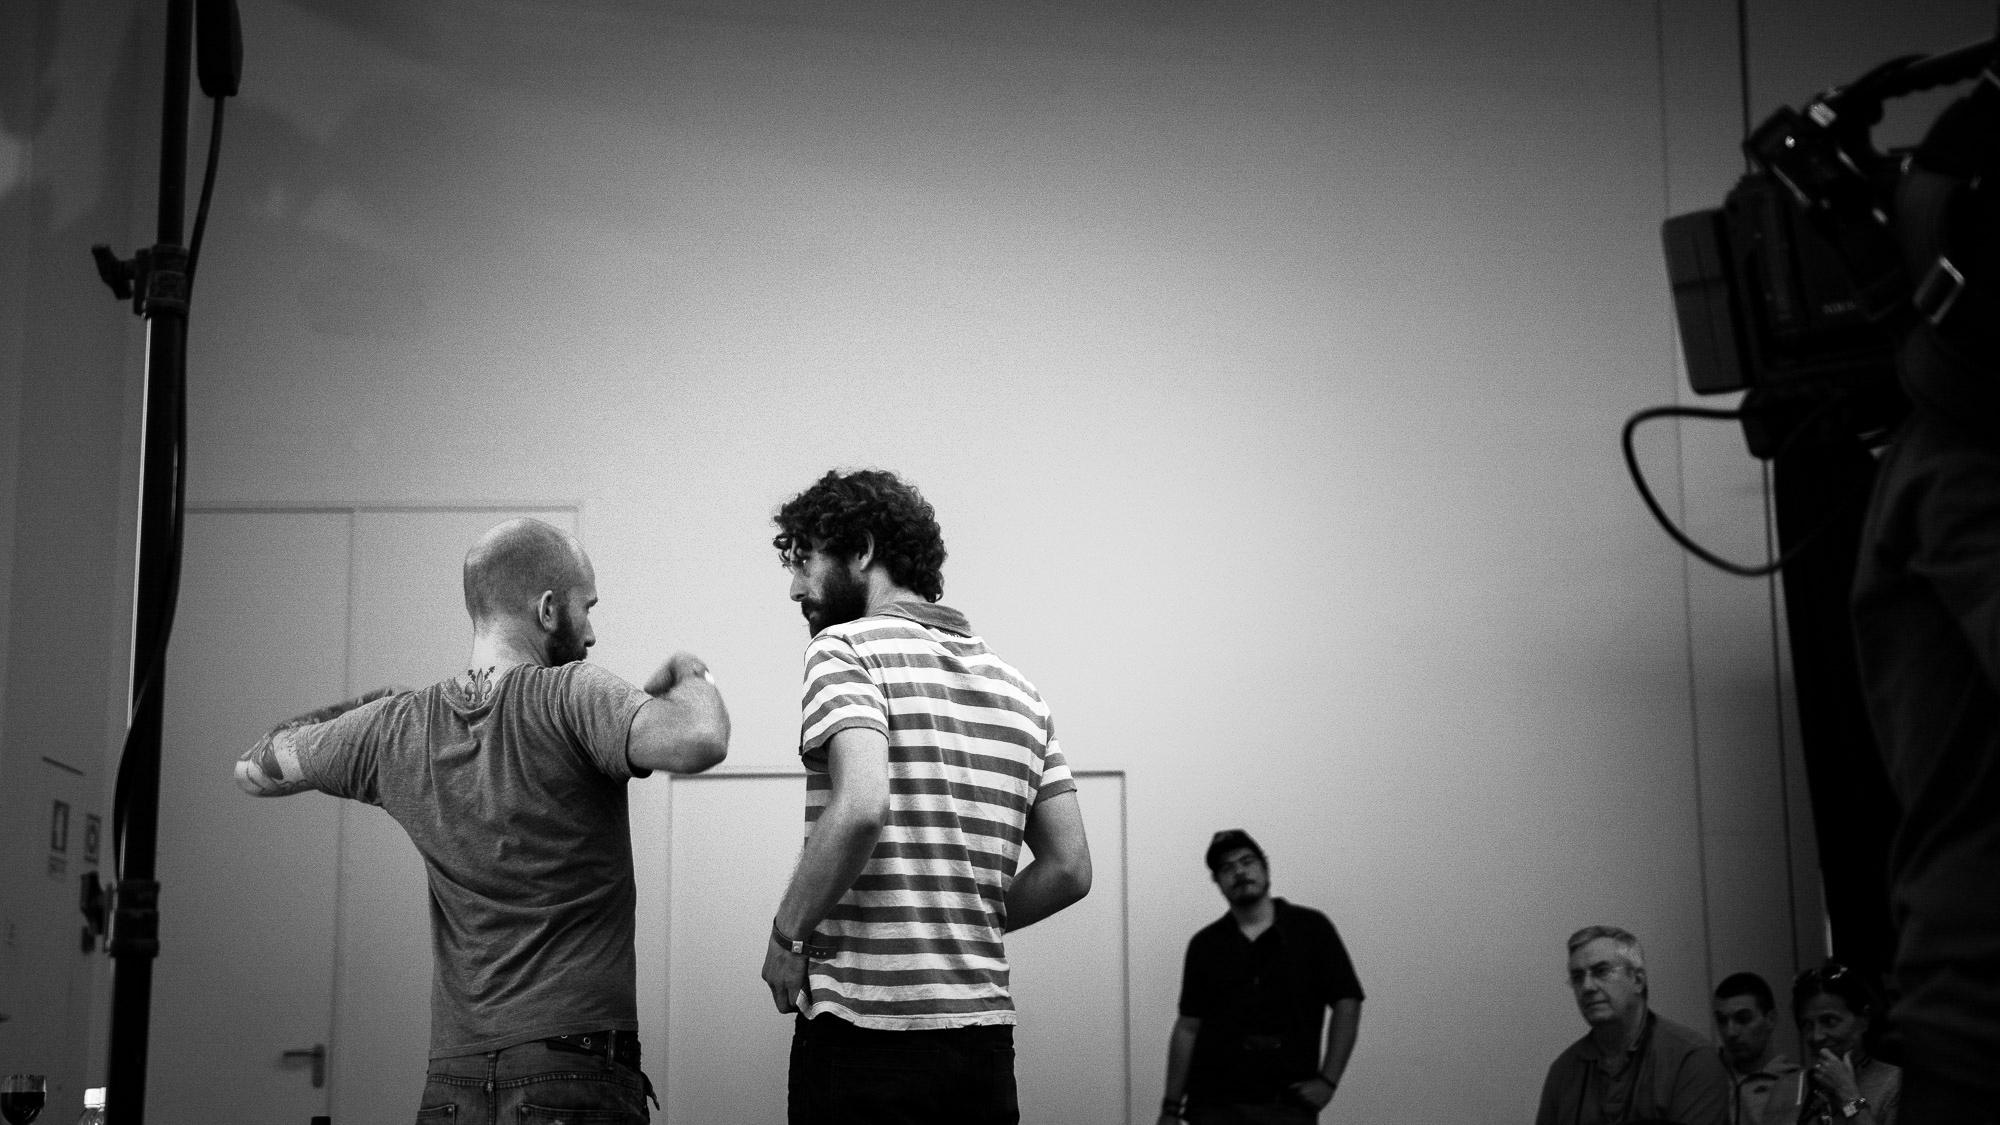 Jeremy Mann Louie Tucci THU 2015 Troia Portugal